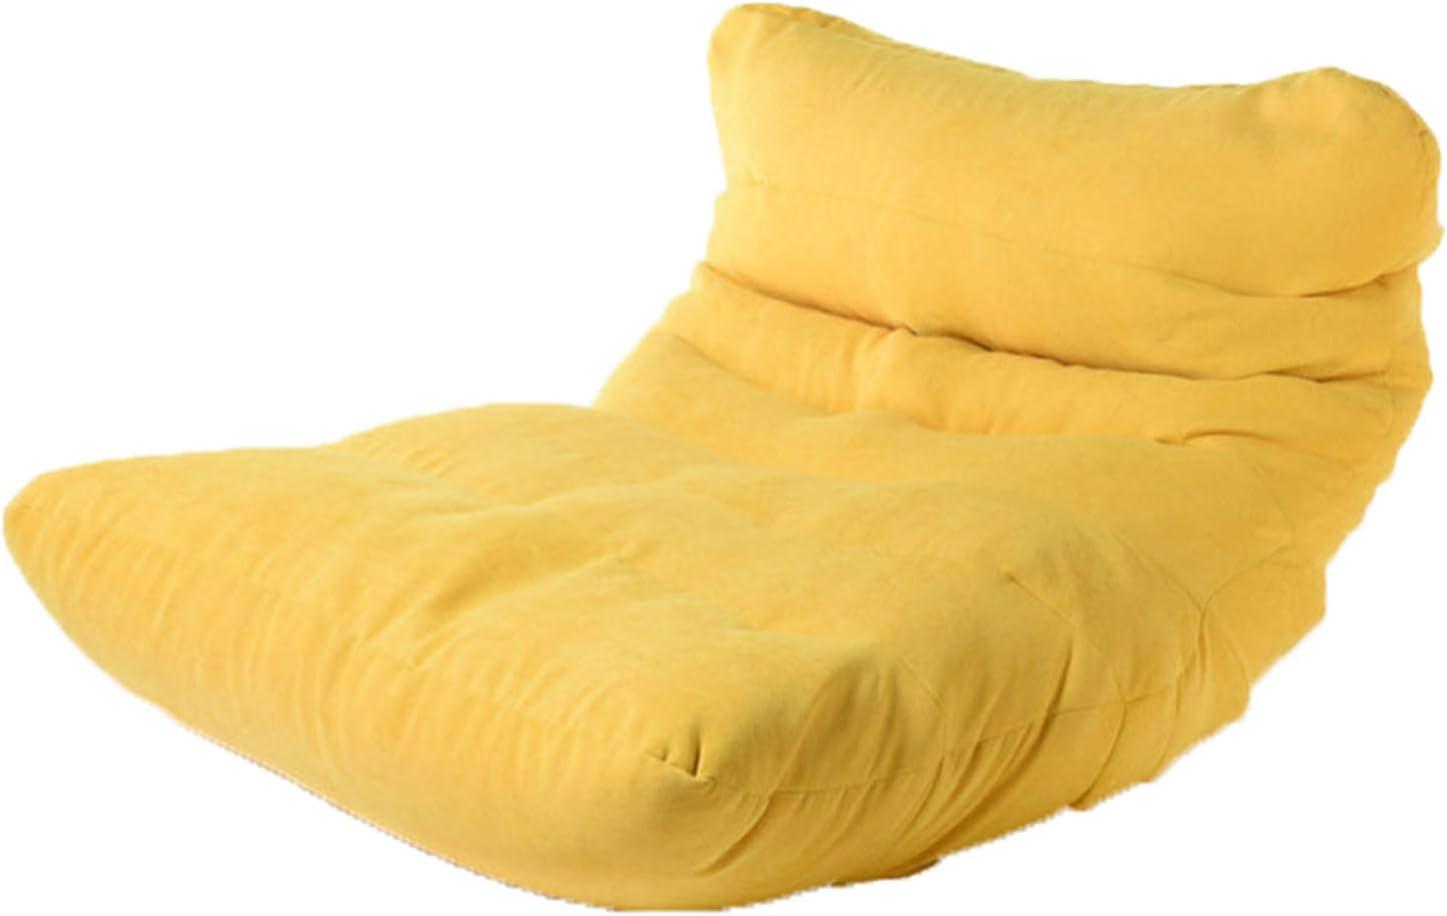 Large Bean Bag Chair Baltimore Mall Cover Financial sales sale No Sofa Portab Filler Tatami Bedroom